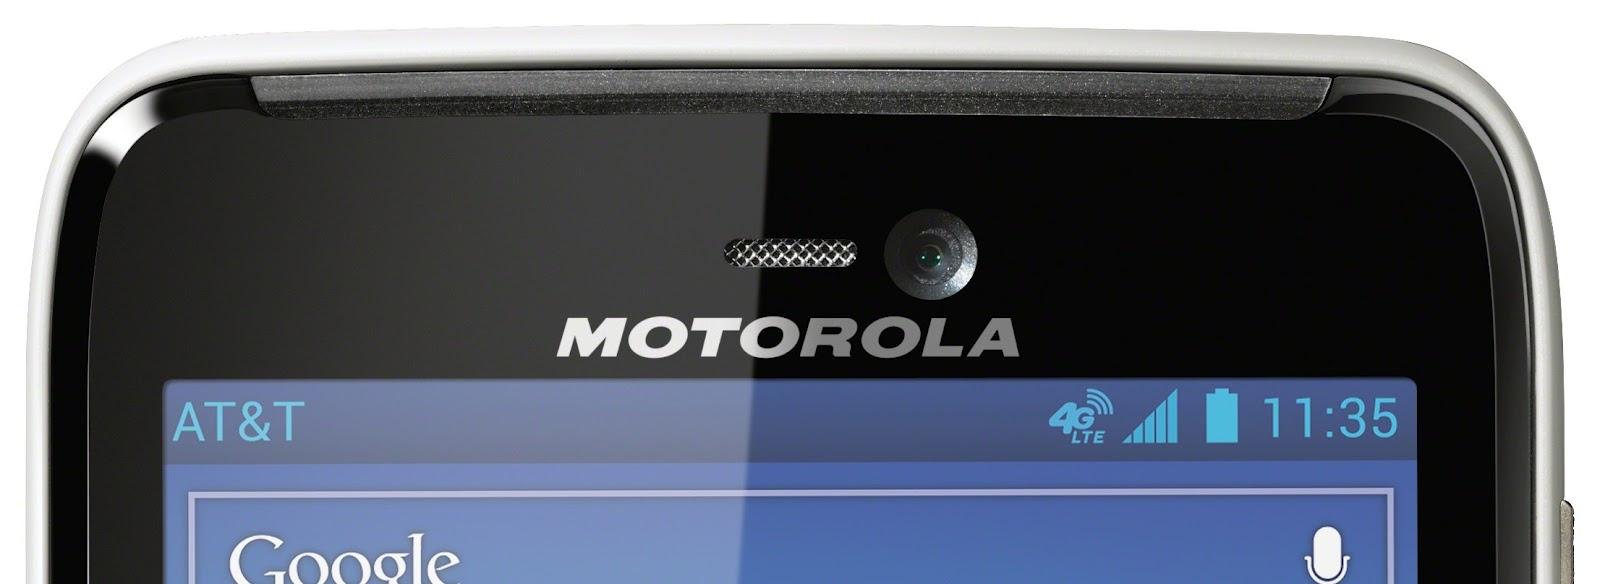 f3a145f41a Motorola Atrix HD MB886 AT T USA ~ Be One Here